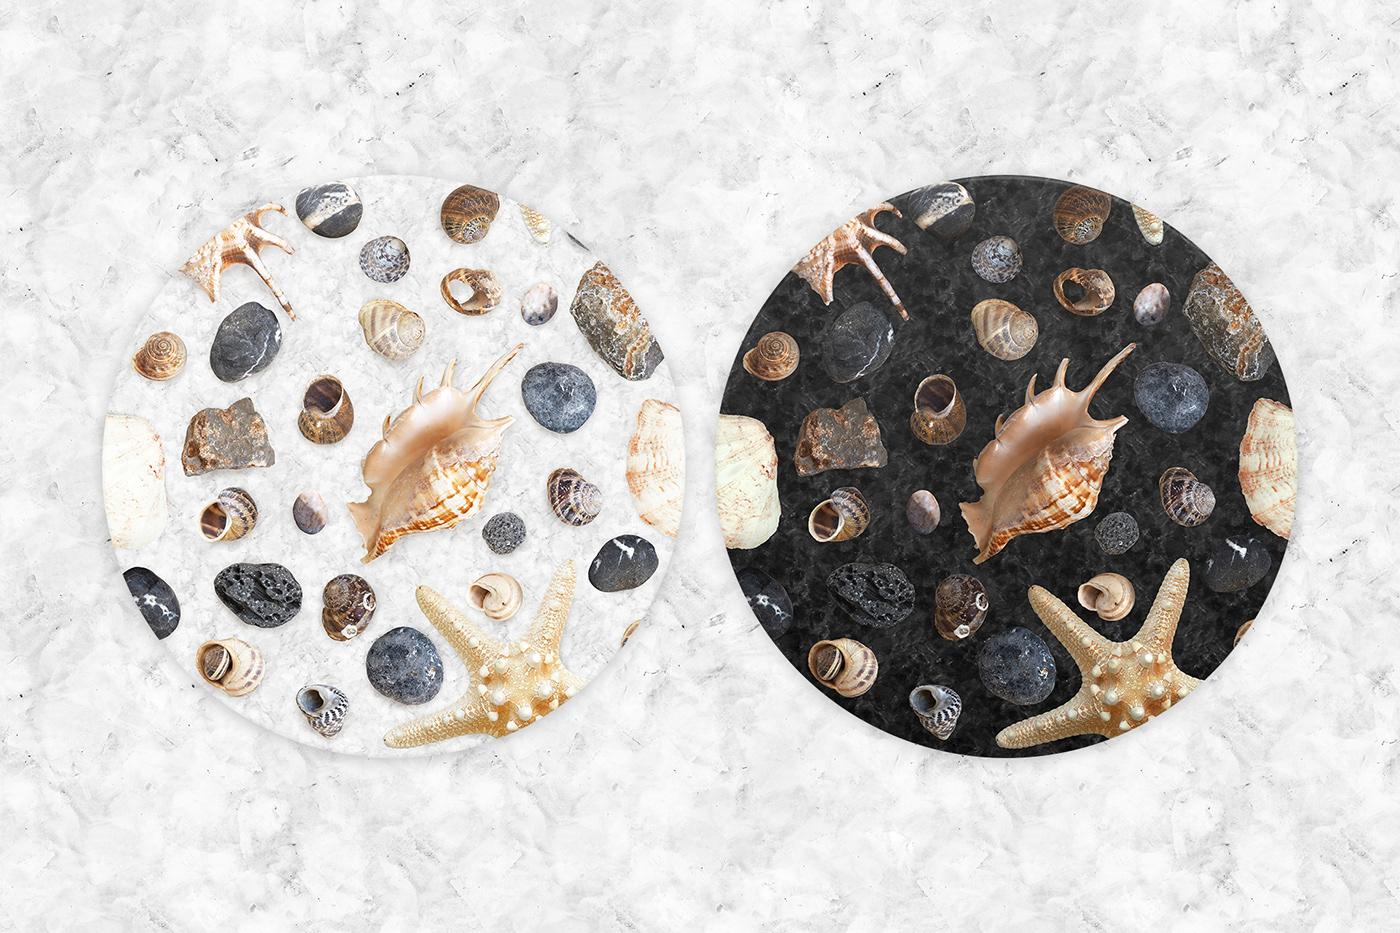 Mockup shell texture marine creator branding  stone souvenir Isolated free